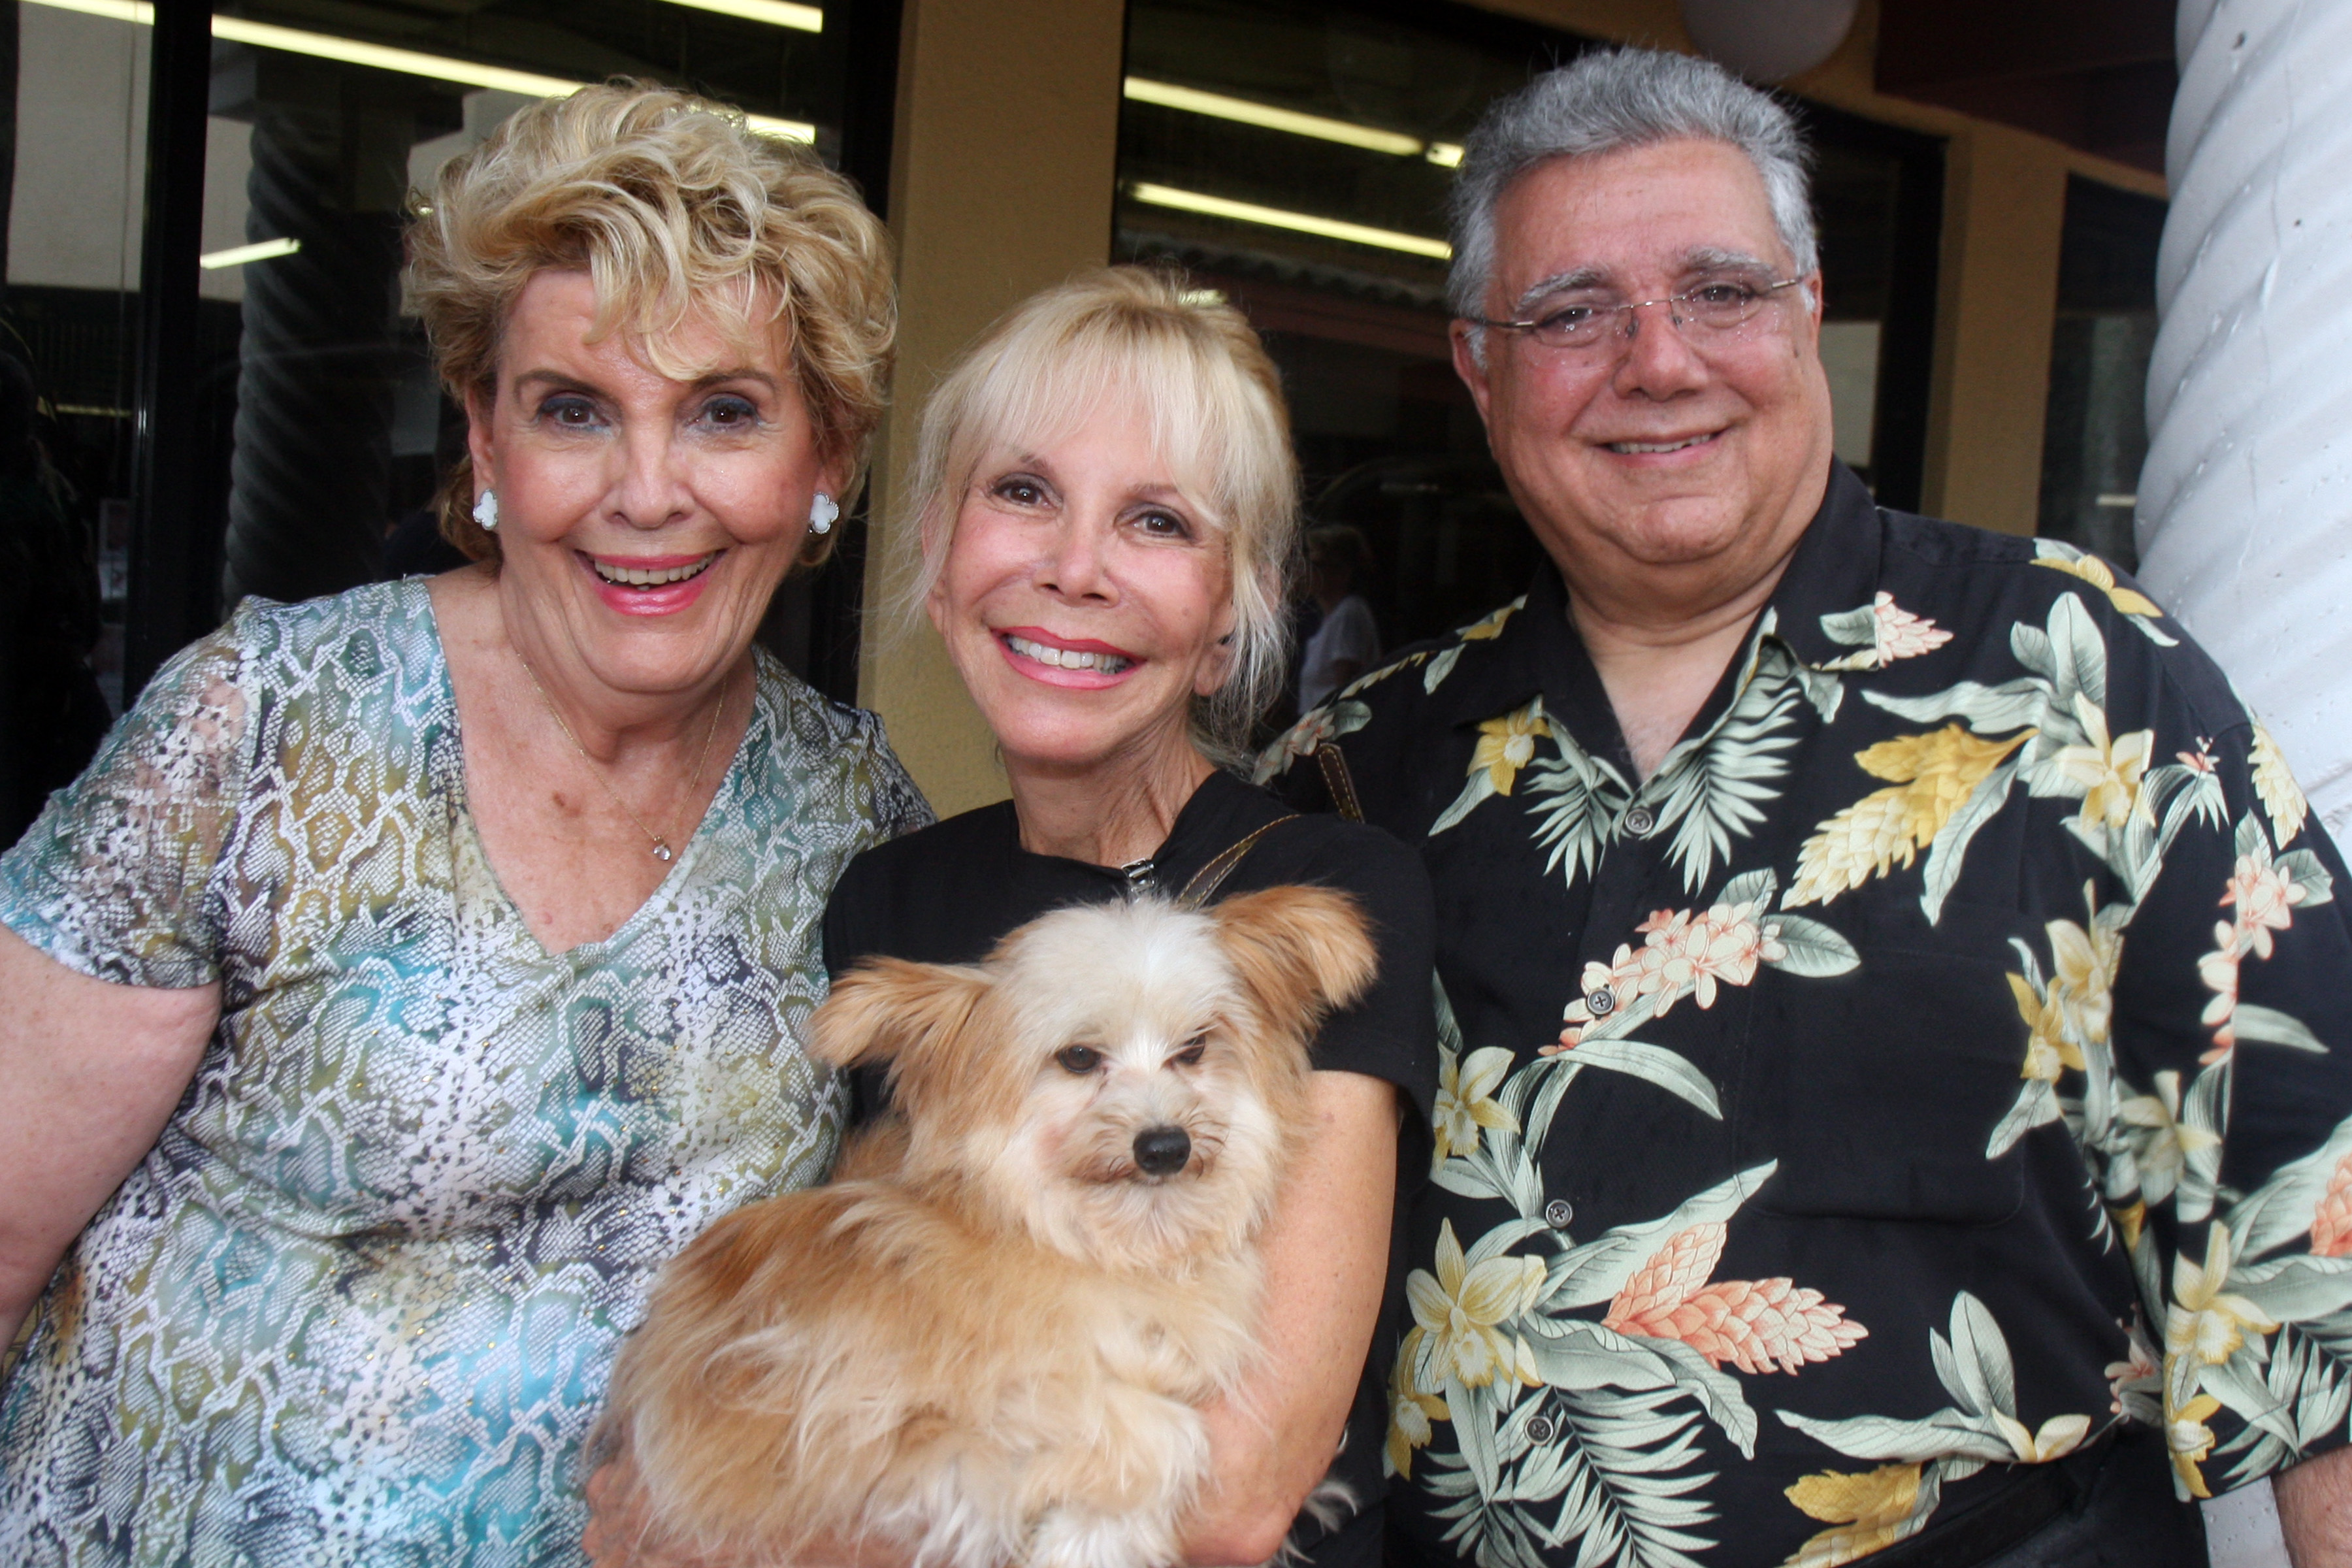 Yvonne Boice, Suzi Goldsmith, Benjamin Franklin (the dog) and Al Zucaro.